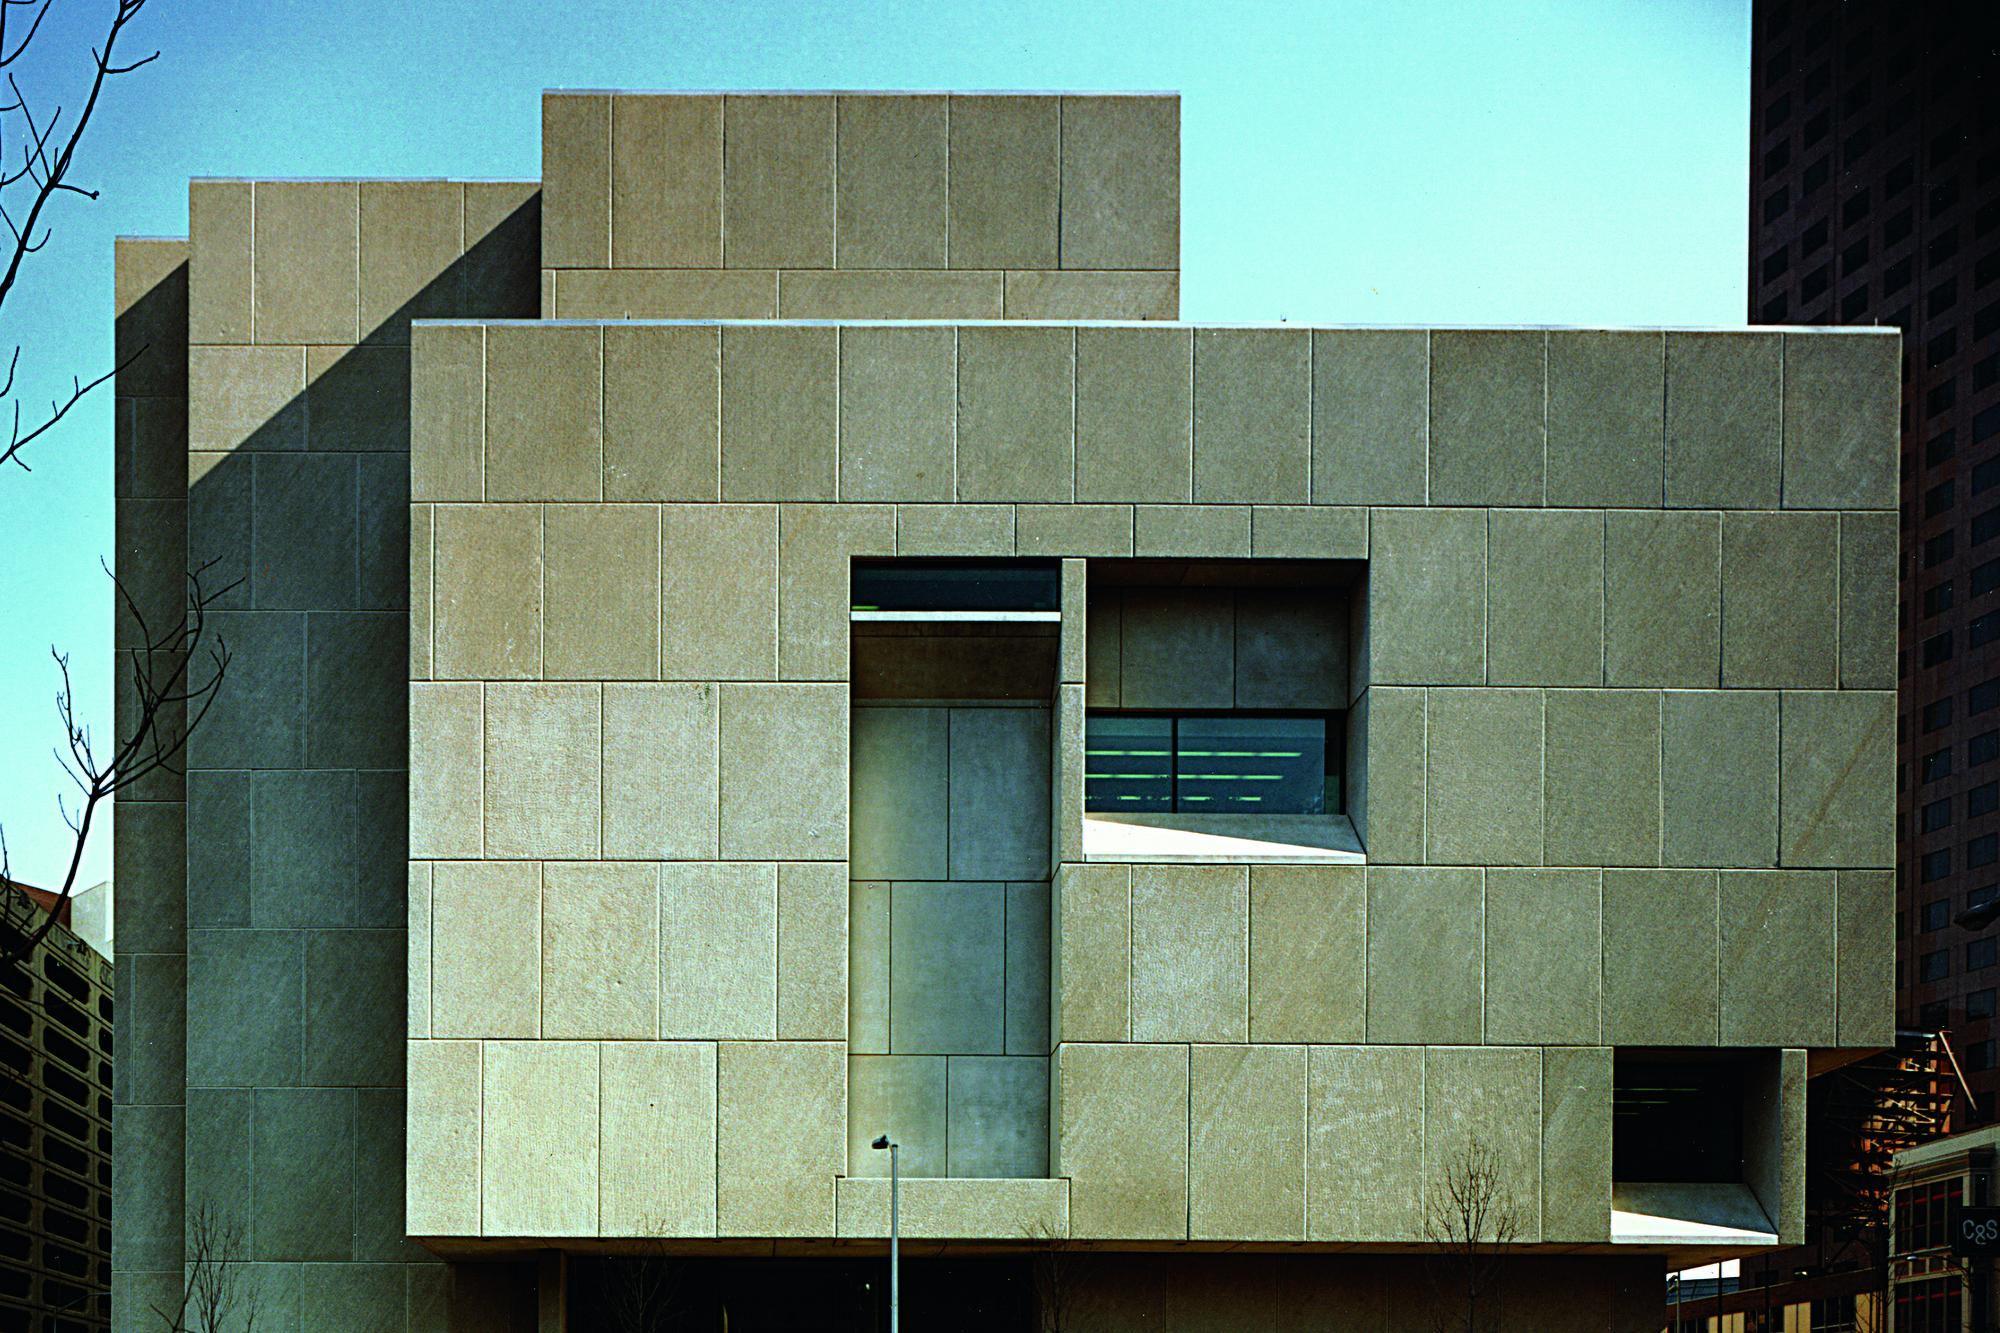 Marcel breuer design architecture architect magazine exhibitions - Marcel breuer architecture ...